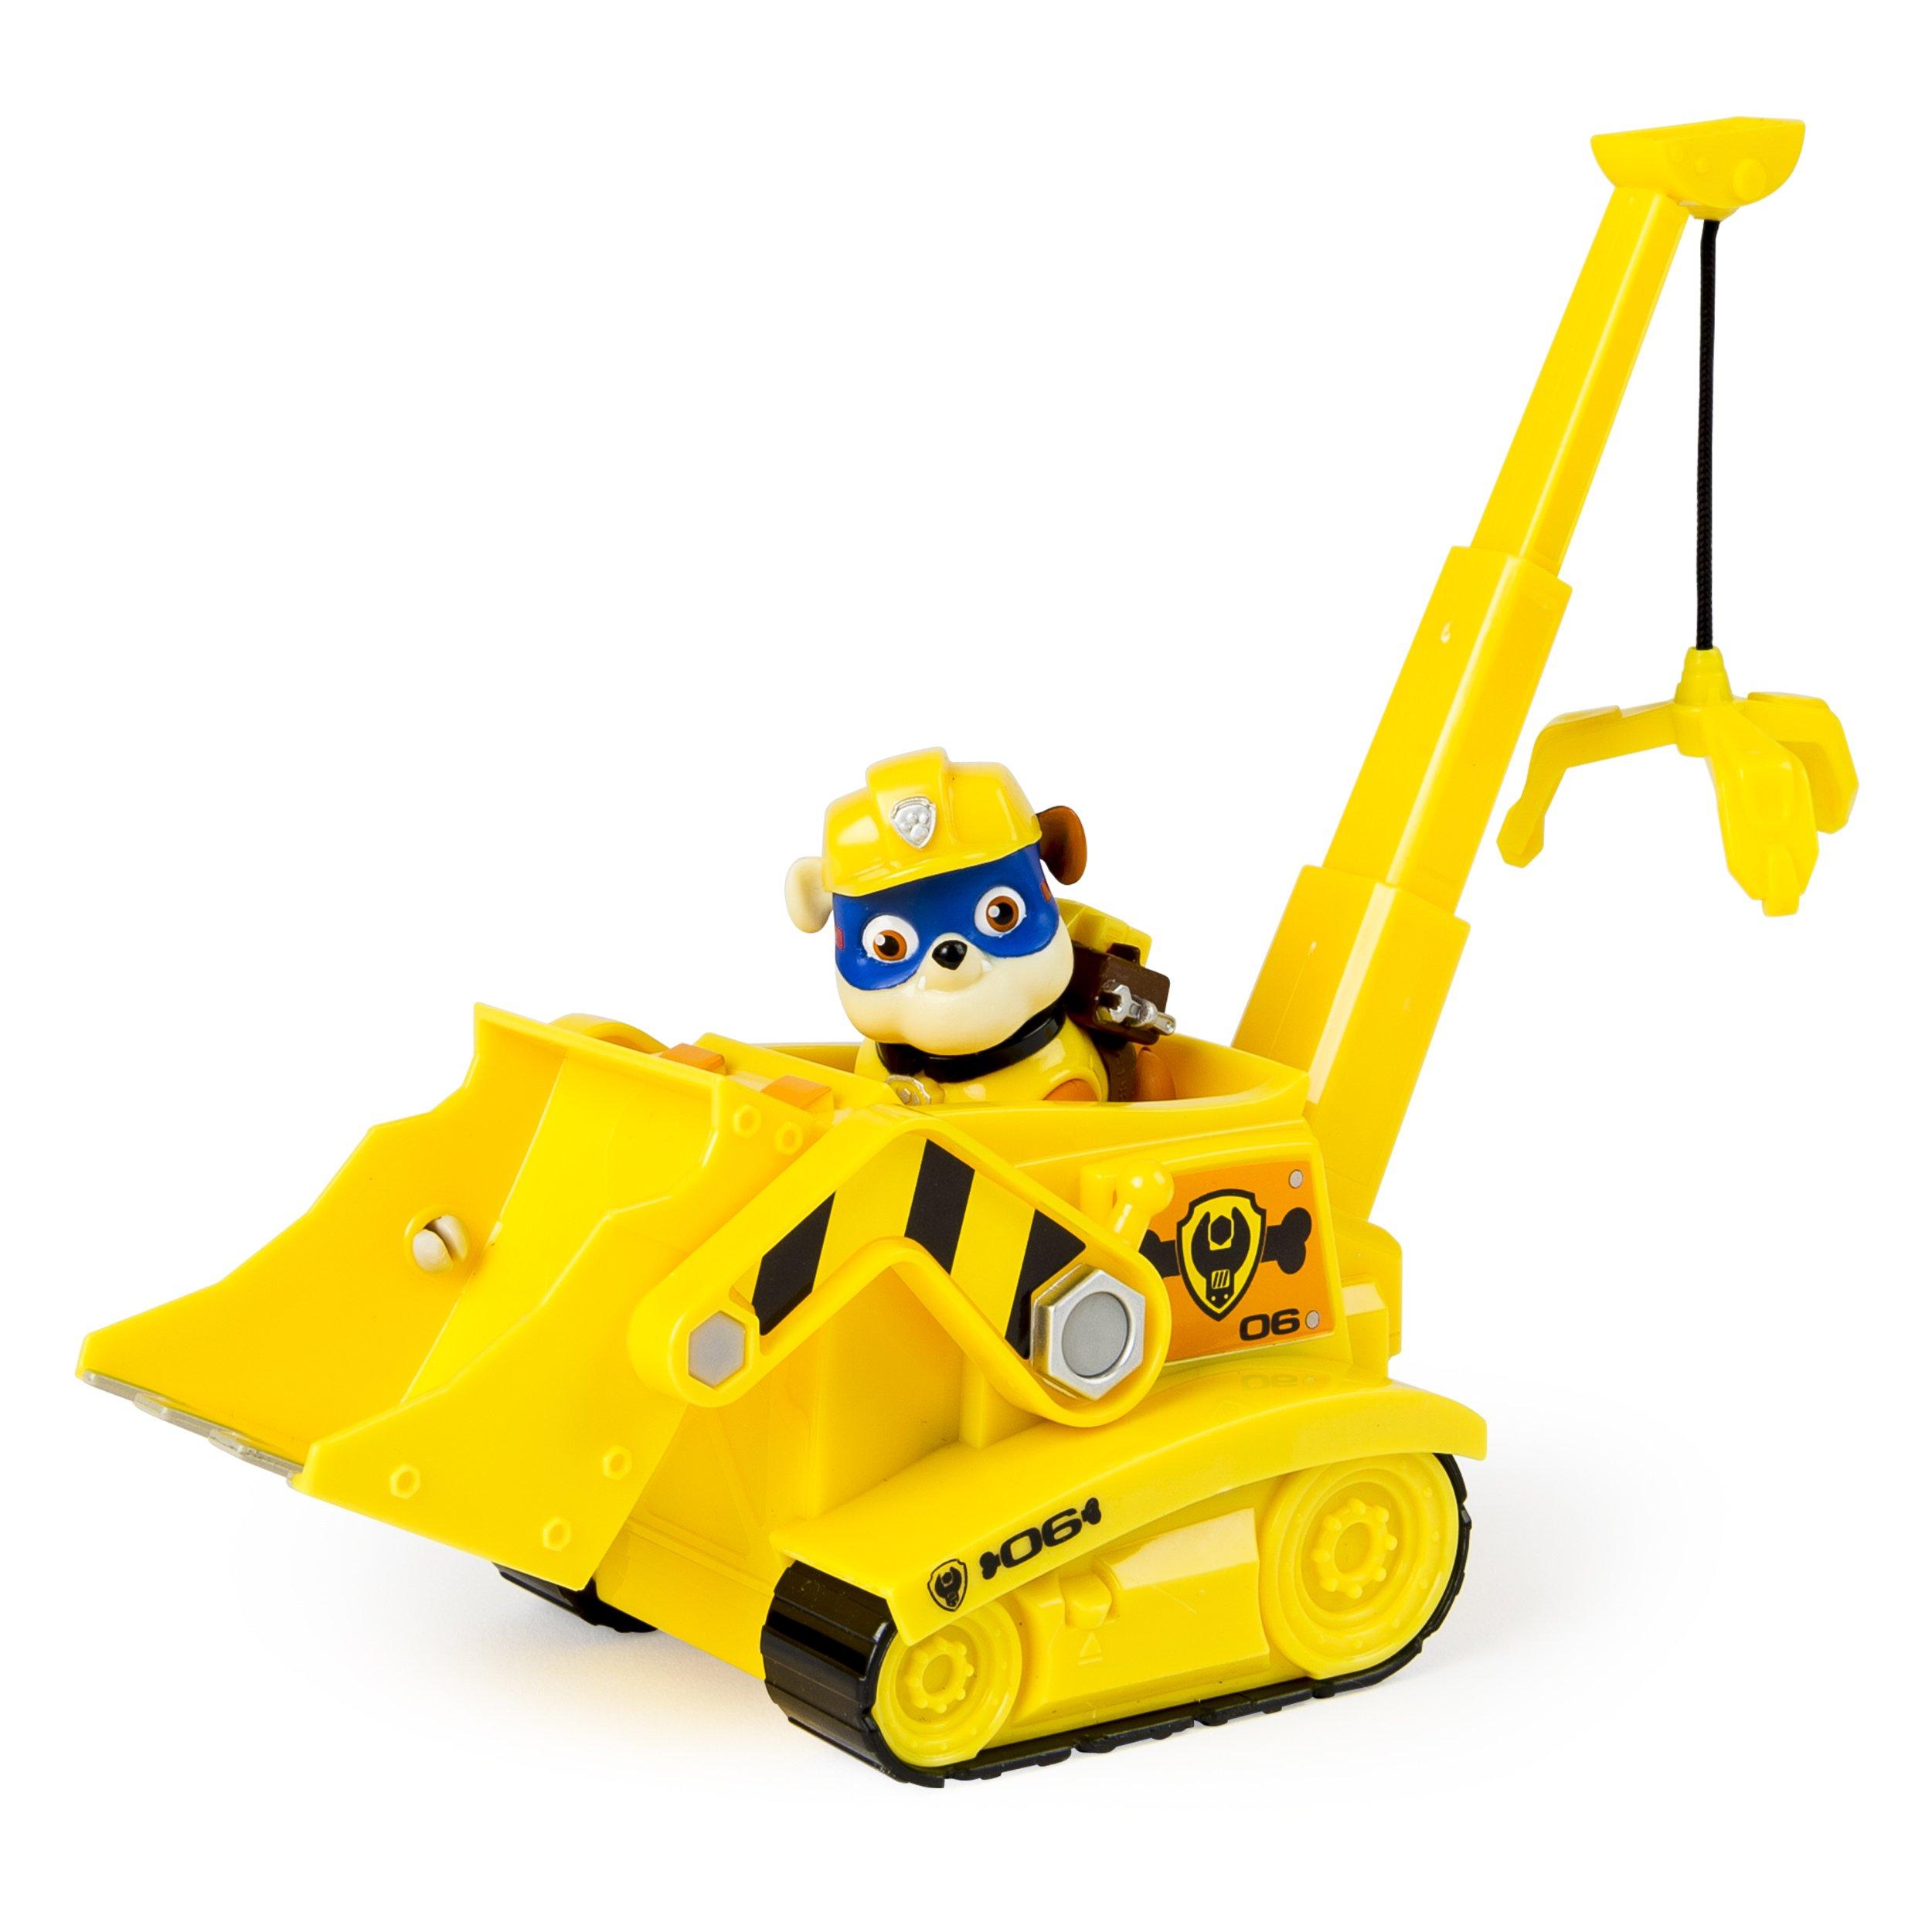 Paw Patrol Super Pup Rubble's Crane, Vehicle Figure by Paw Patrol (Image #3)